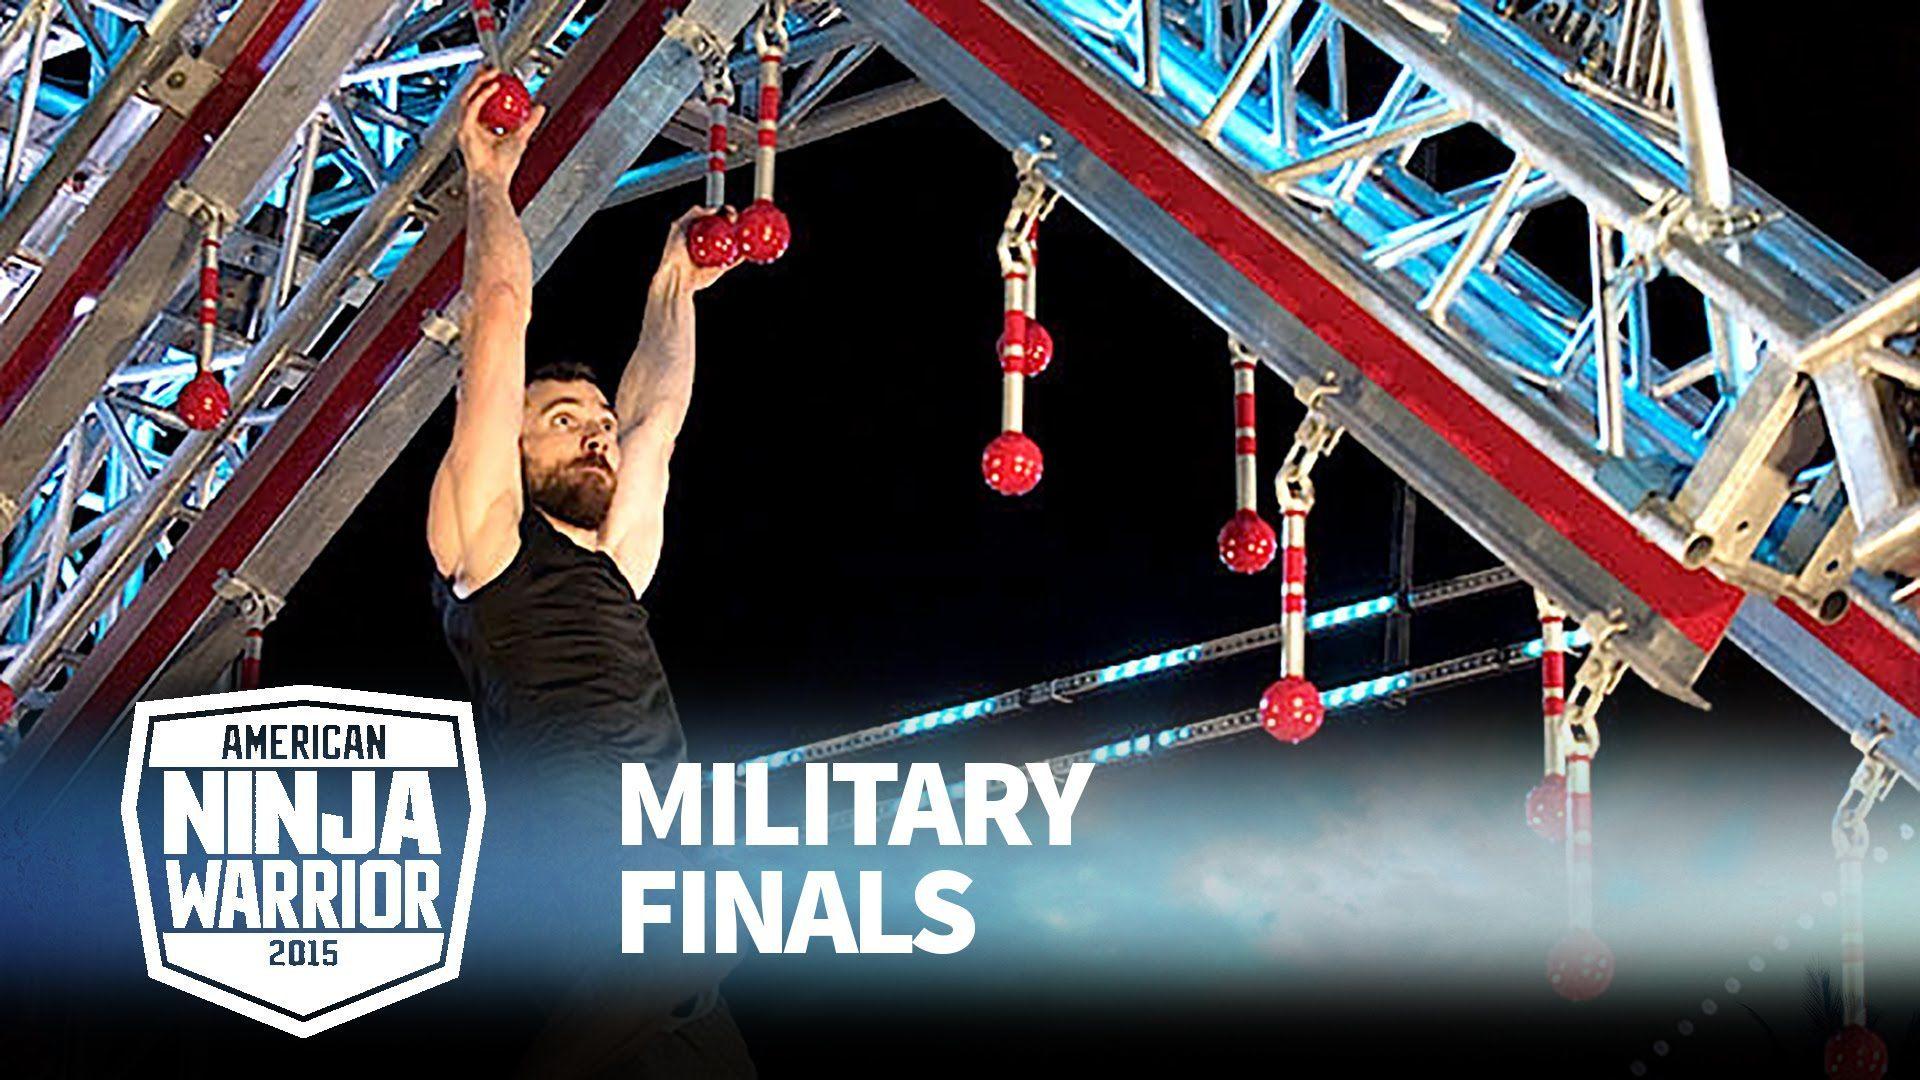 American Ninja Warrior Military Finals Recap 2015 Images